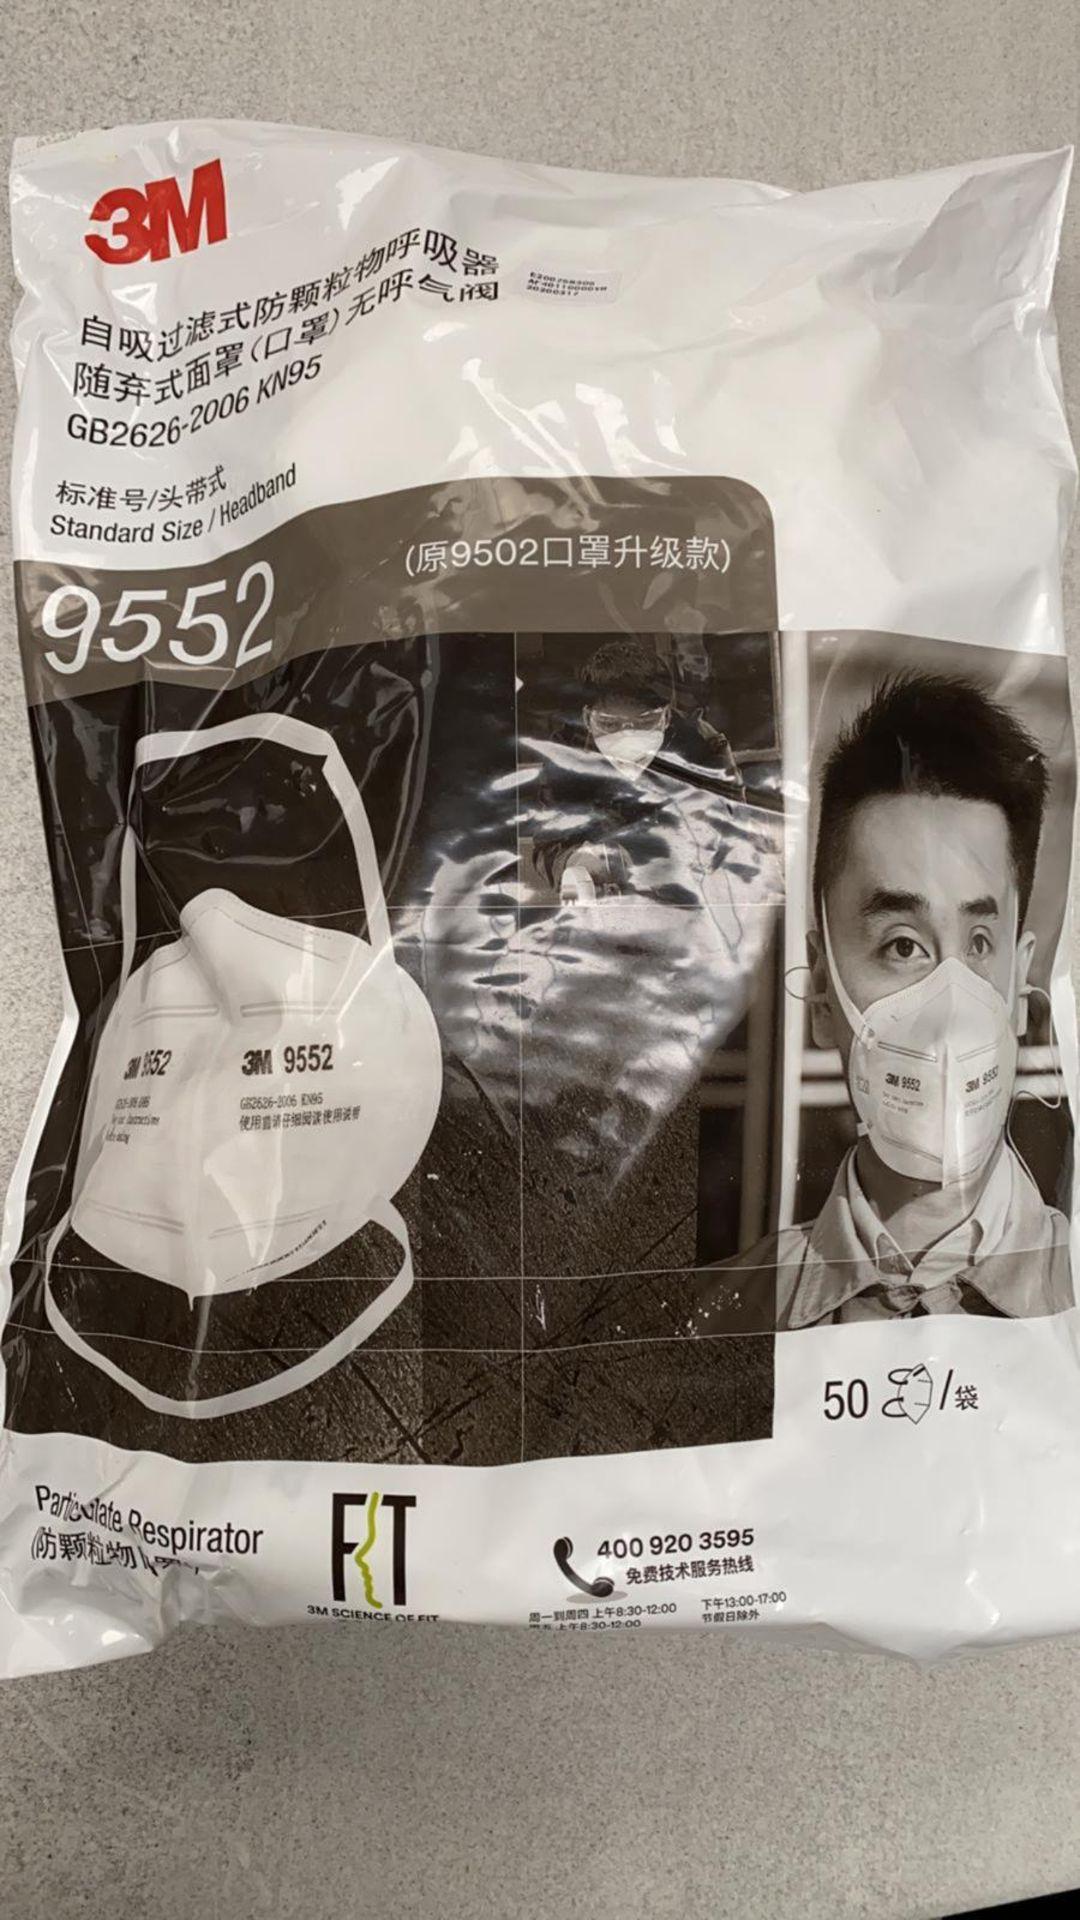 Lot 46 - 500x 3M 9552 Protective face mask (headband fitting) 50 per bag, 10 bags per carton.